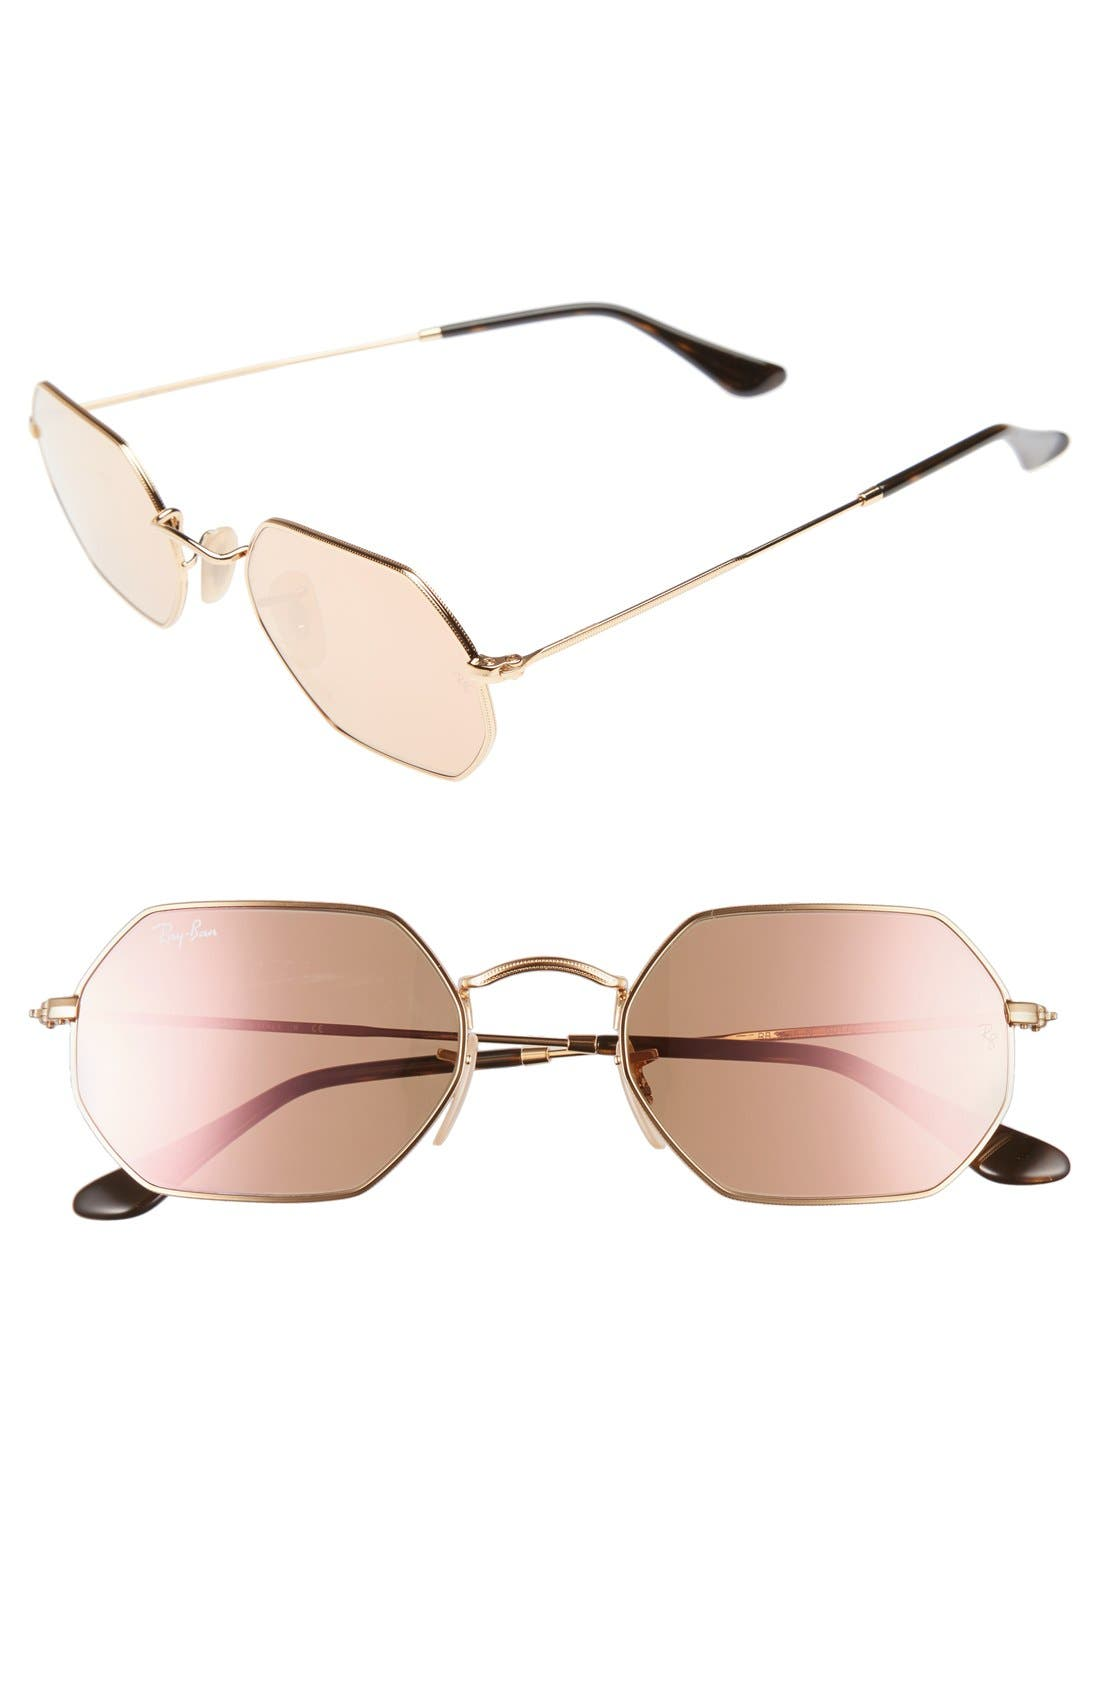 Icons 53mm Sunglasses,                             Main thumbnail 1, color,                             220